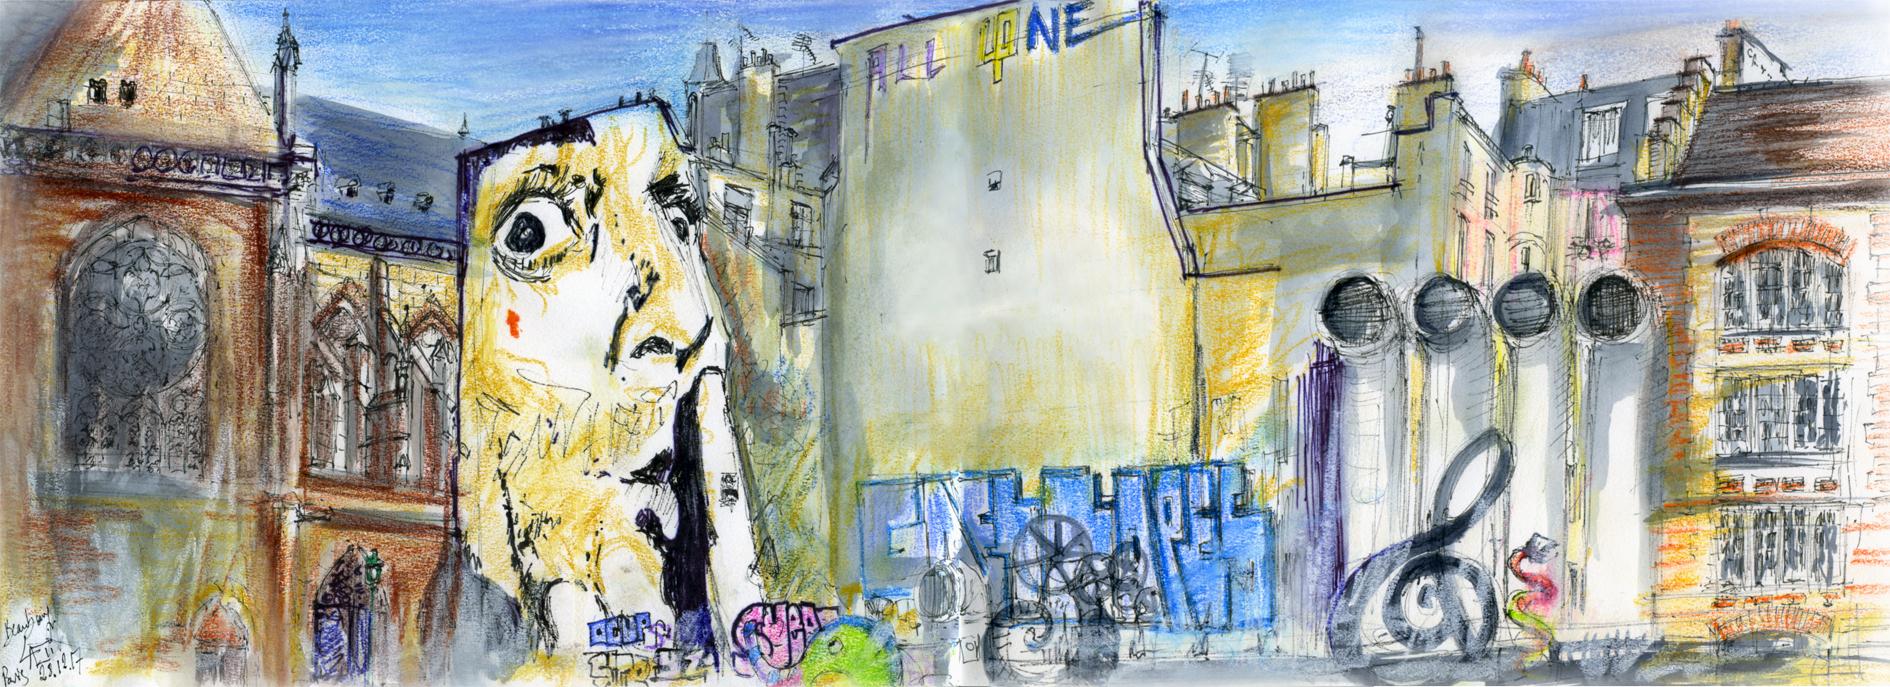 29.12.2017- Chut! IRCAM – Fontaine Stravinsky, Beaubourg (Paris,Fr.)